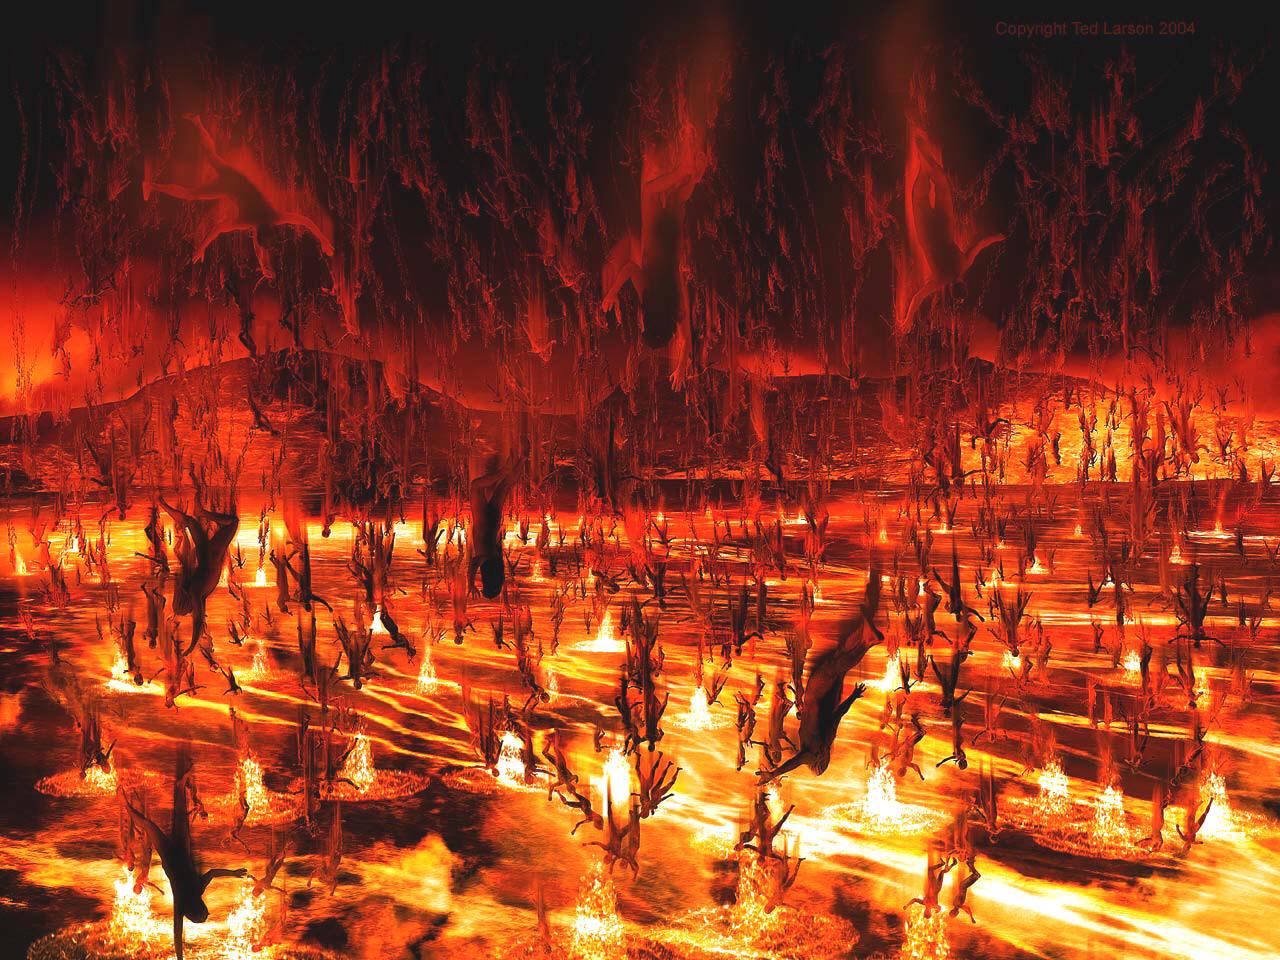 pokol látomása infierno_ilust1.jpg